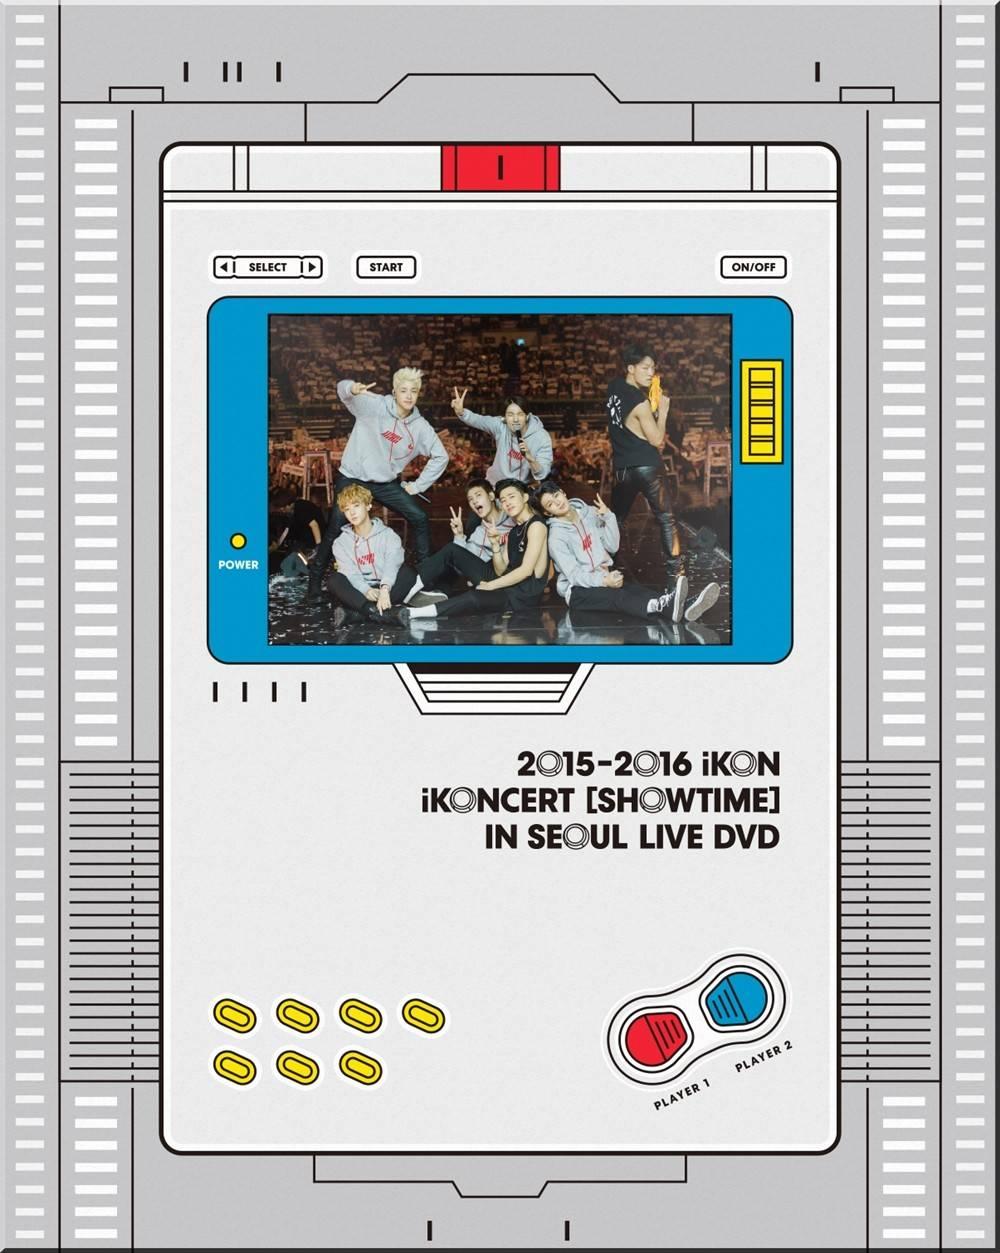 iKON - 2015, 2016 iKON iKONCERT Showtime in Seoul Live DVD